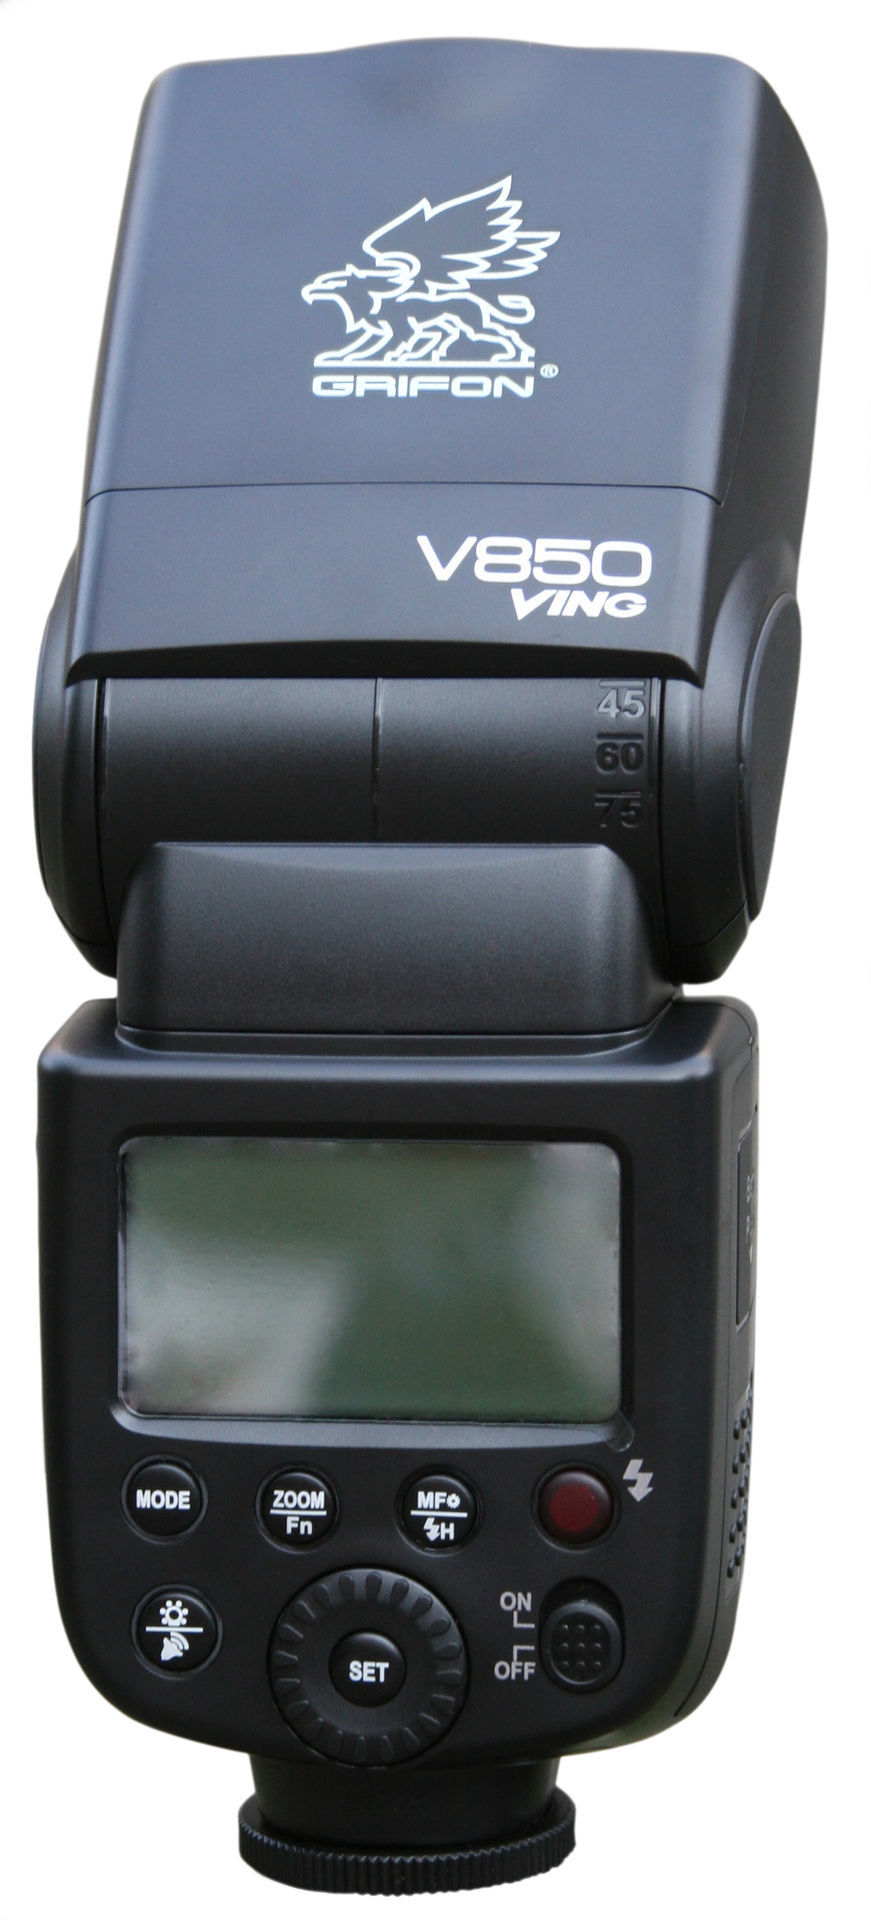 Grifon V850